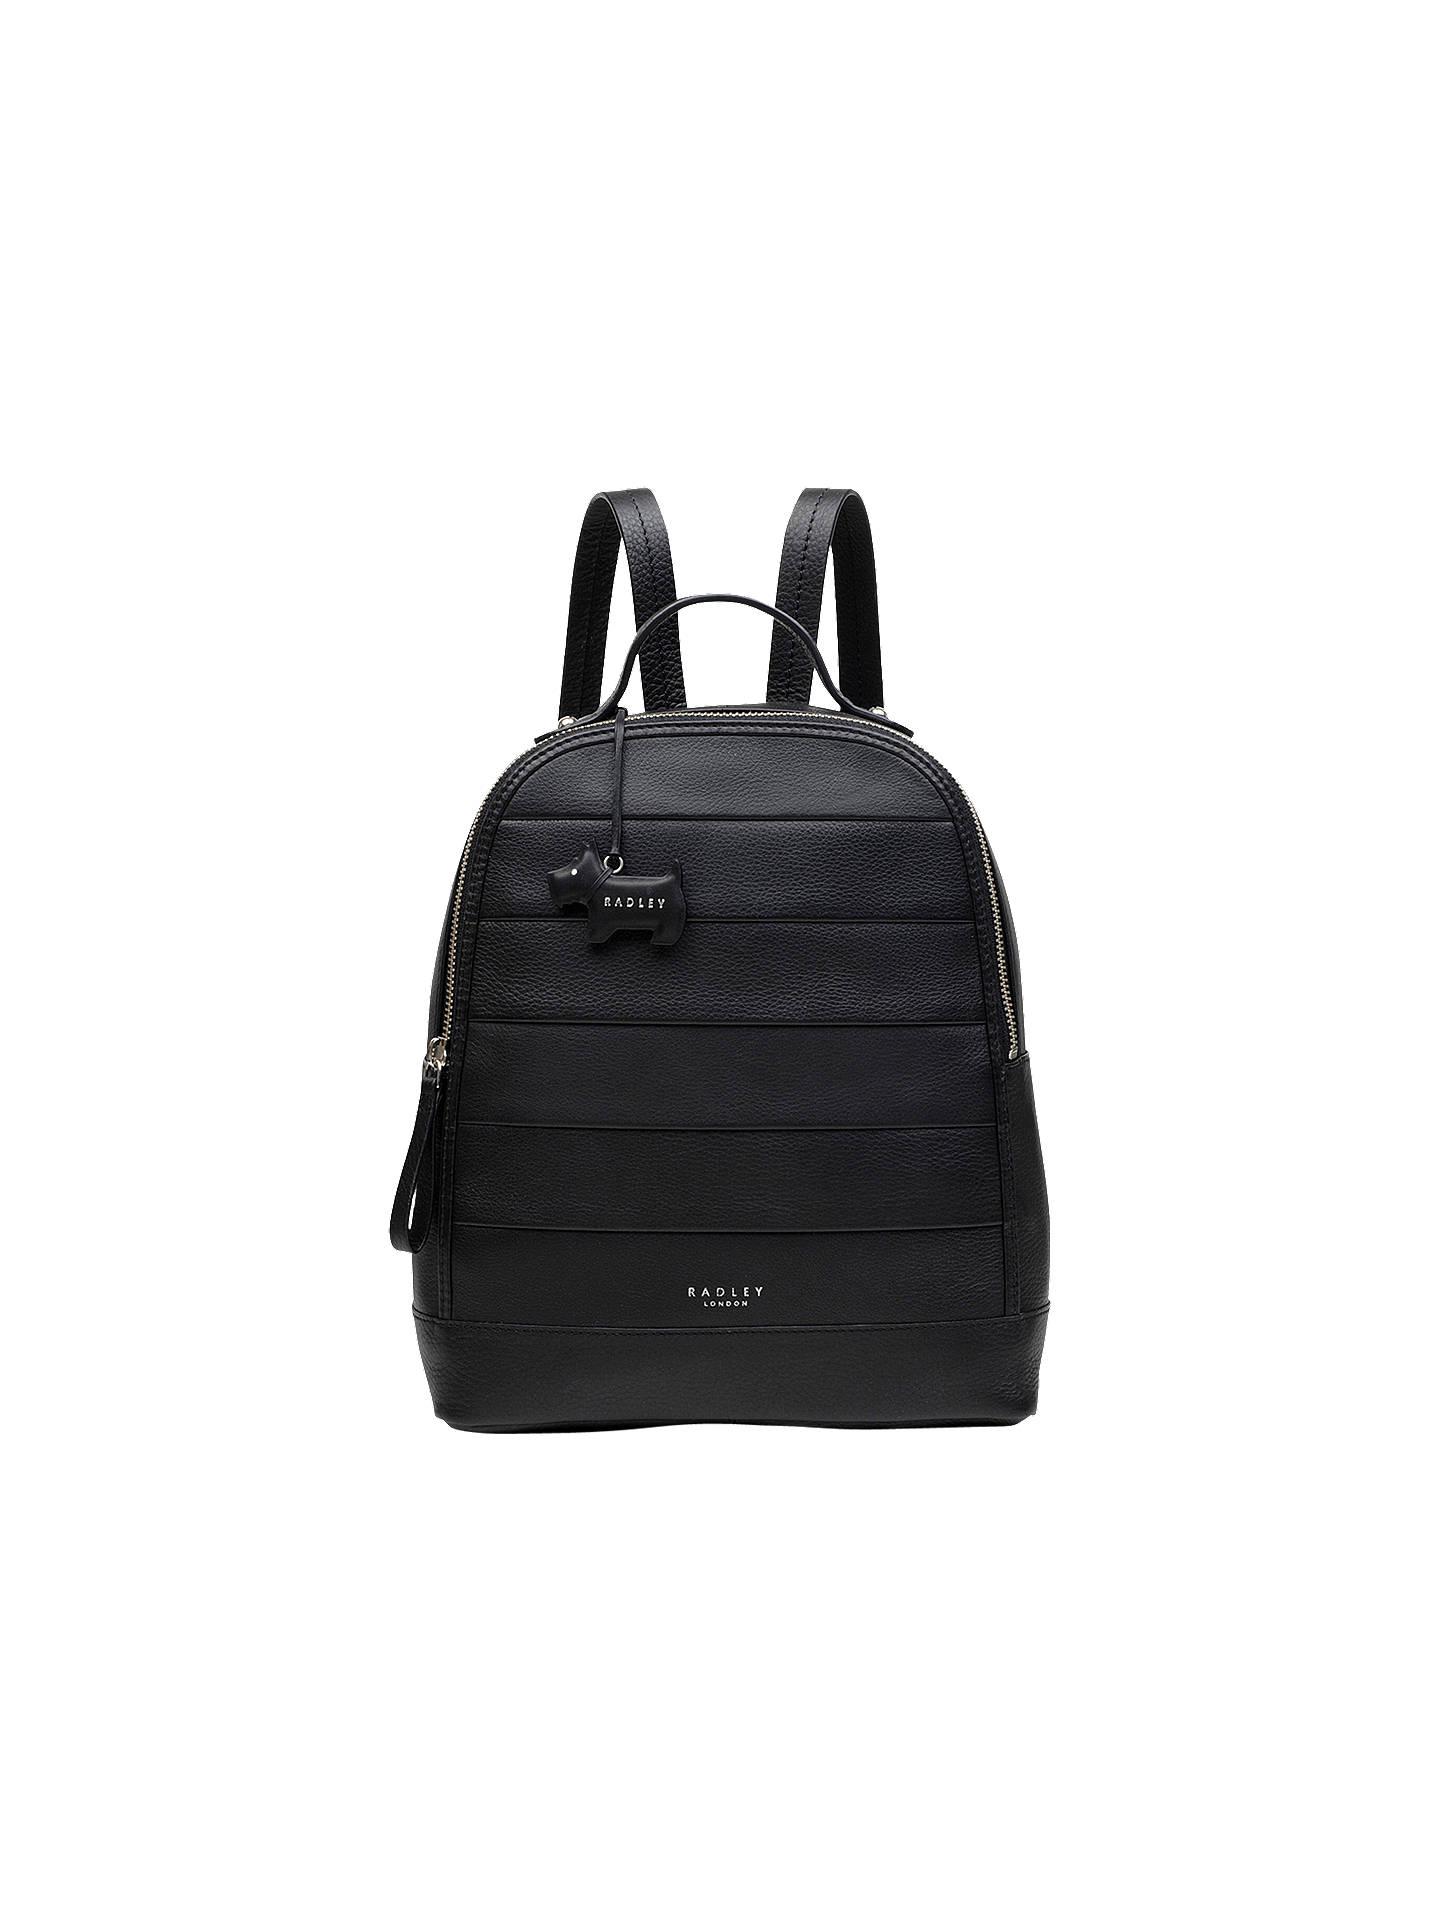 7c37cd3be820 BuyRadley Babington Medium Leather Backpack, Black Online at johnlewis.com  ...